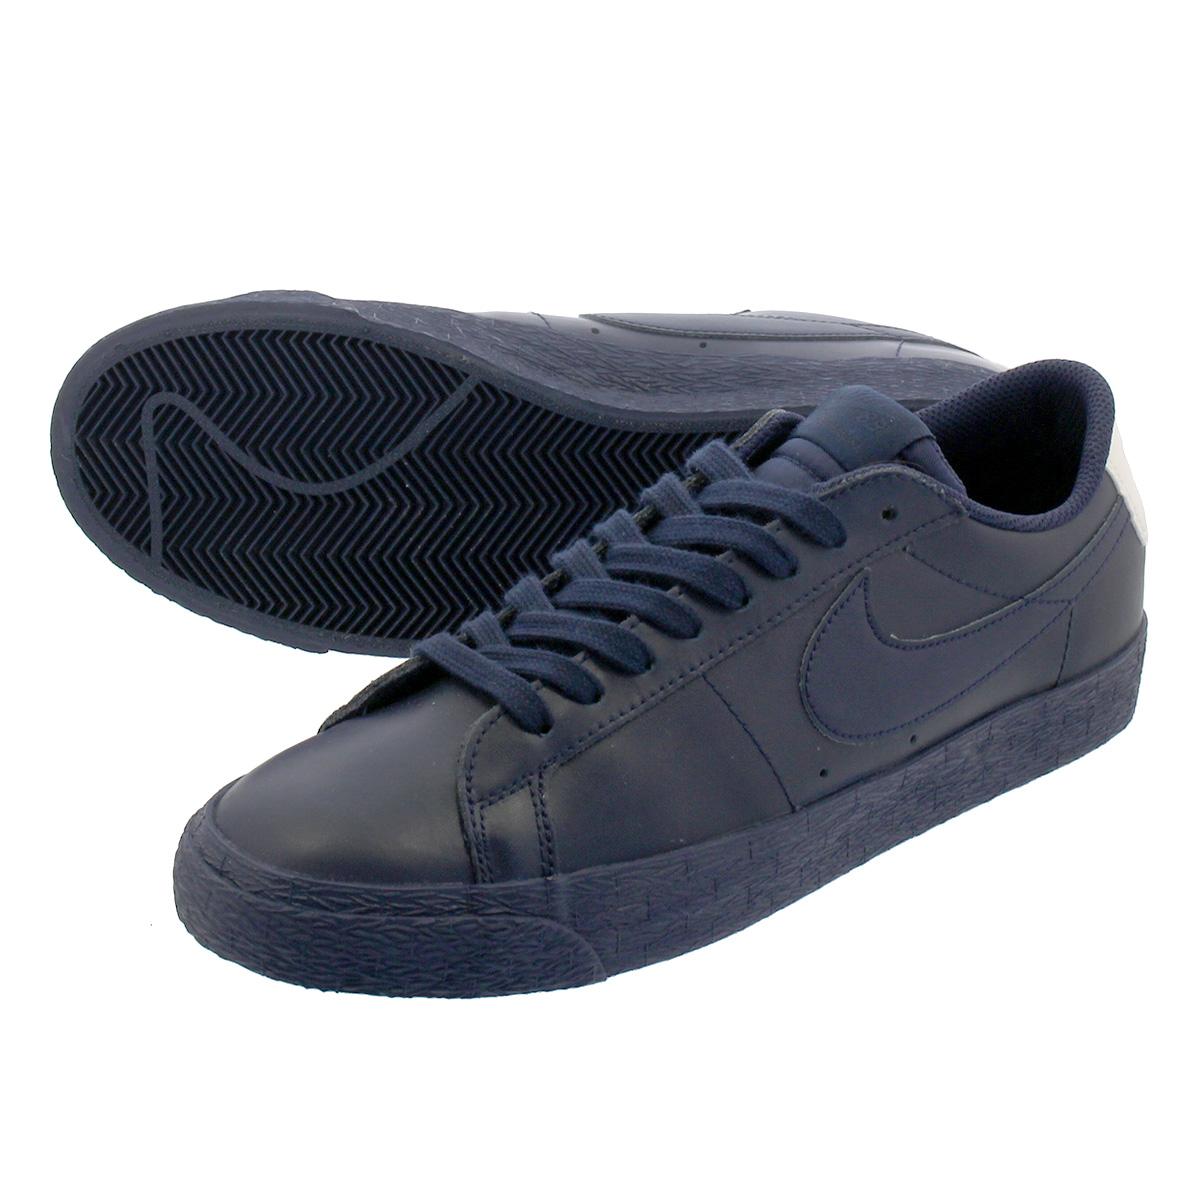 separation shoes best sell buy best NIKE SB BLAZER ZOOM LOW Nike SB blazer zoom low OBSIDIAN/PHANTOM/OBSIDIAN  864,347-403